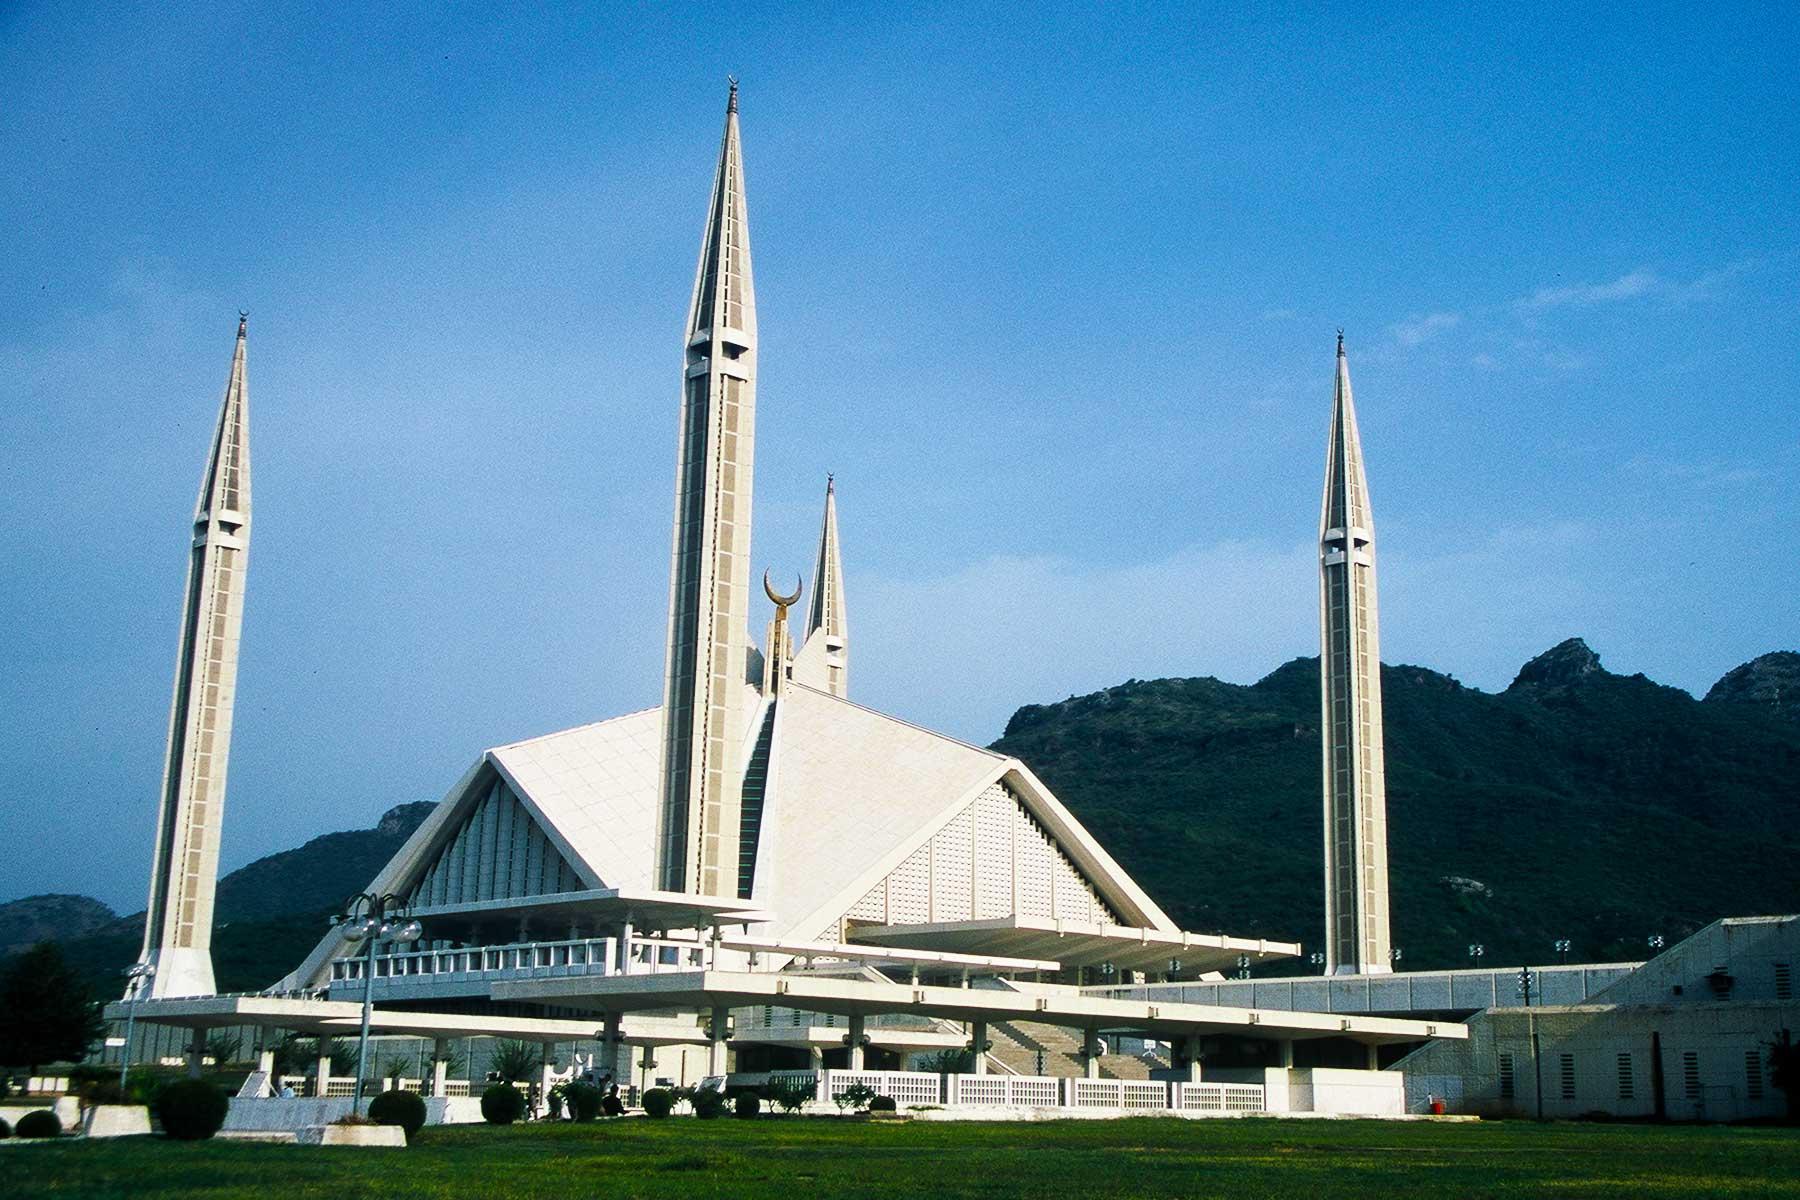 Faisal Mosque Islamabad - Steven A Martin PhD -  Islam in Pakistan - Pakistan Photo Journal - Study Abroad